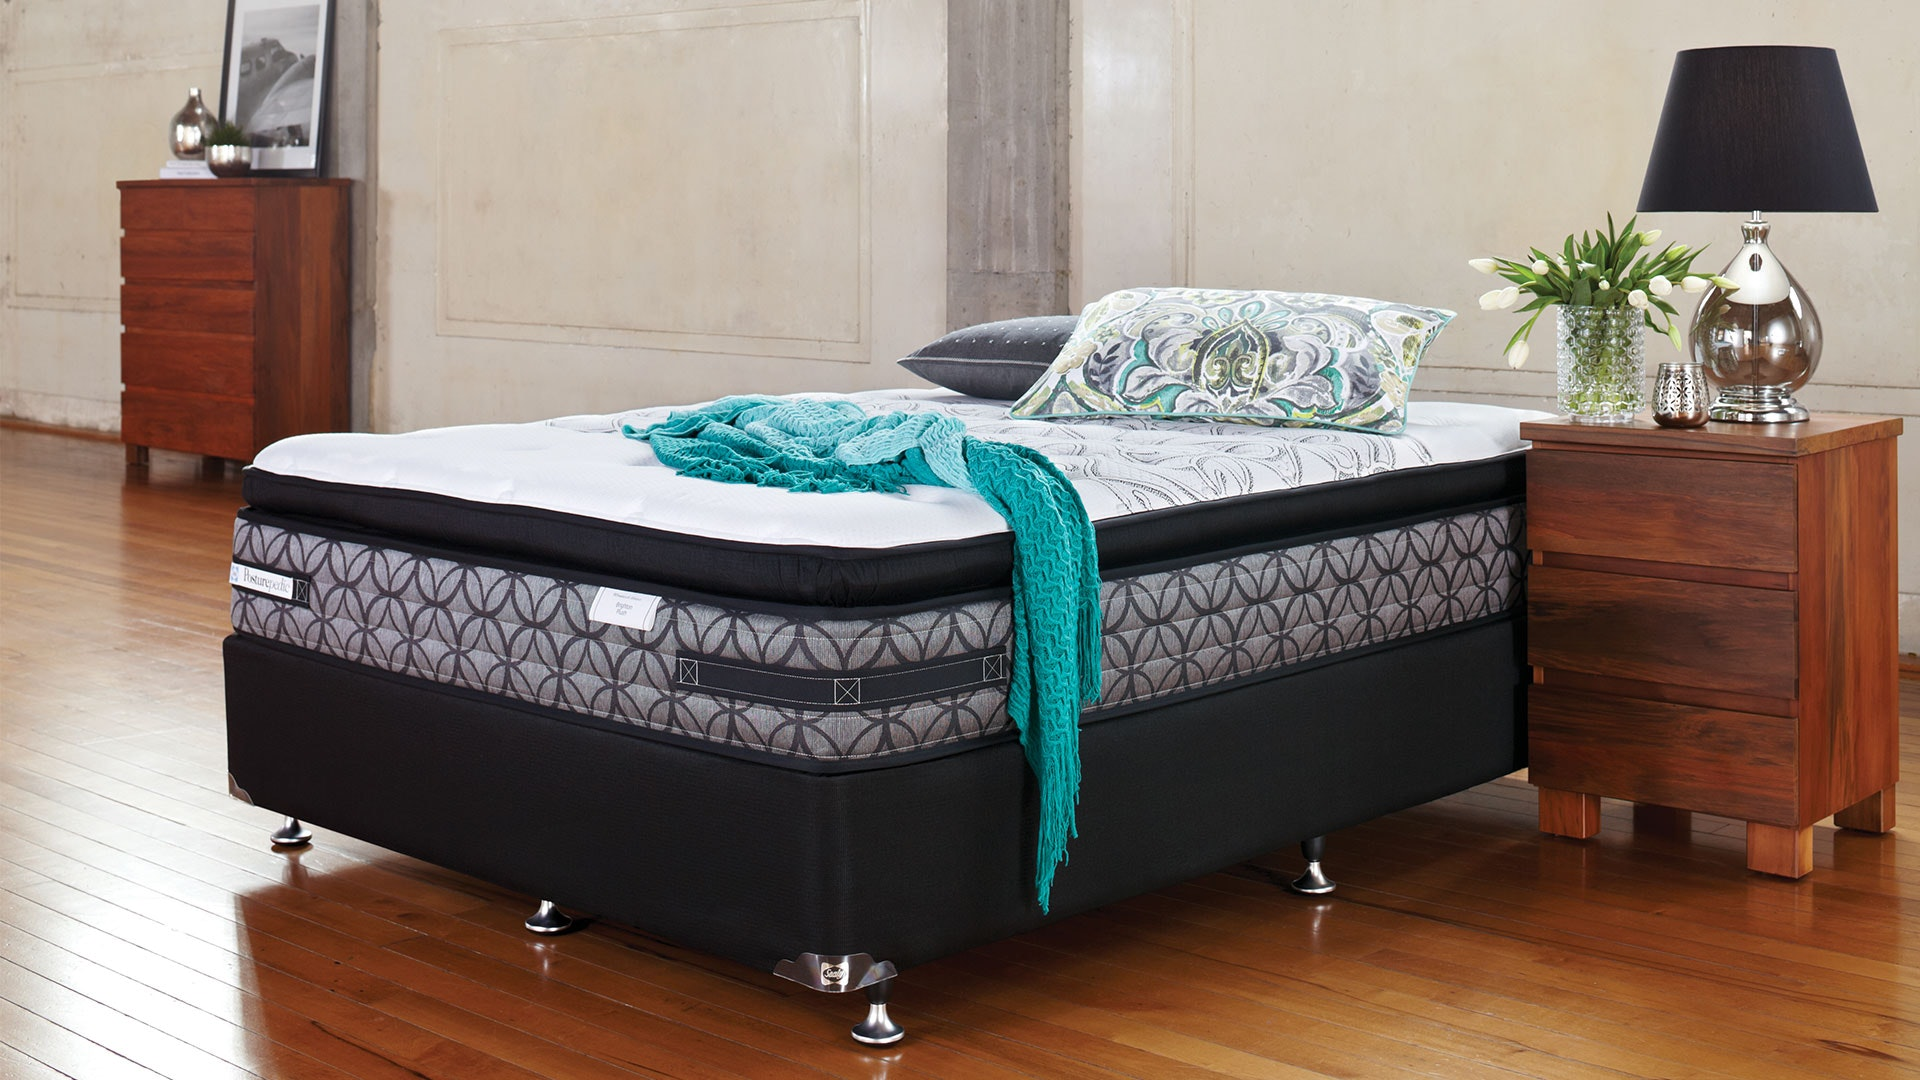 Brighton Plush King Bed by Sealy Posturepedic